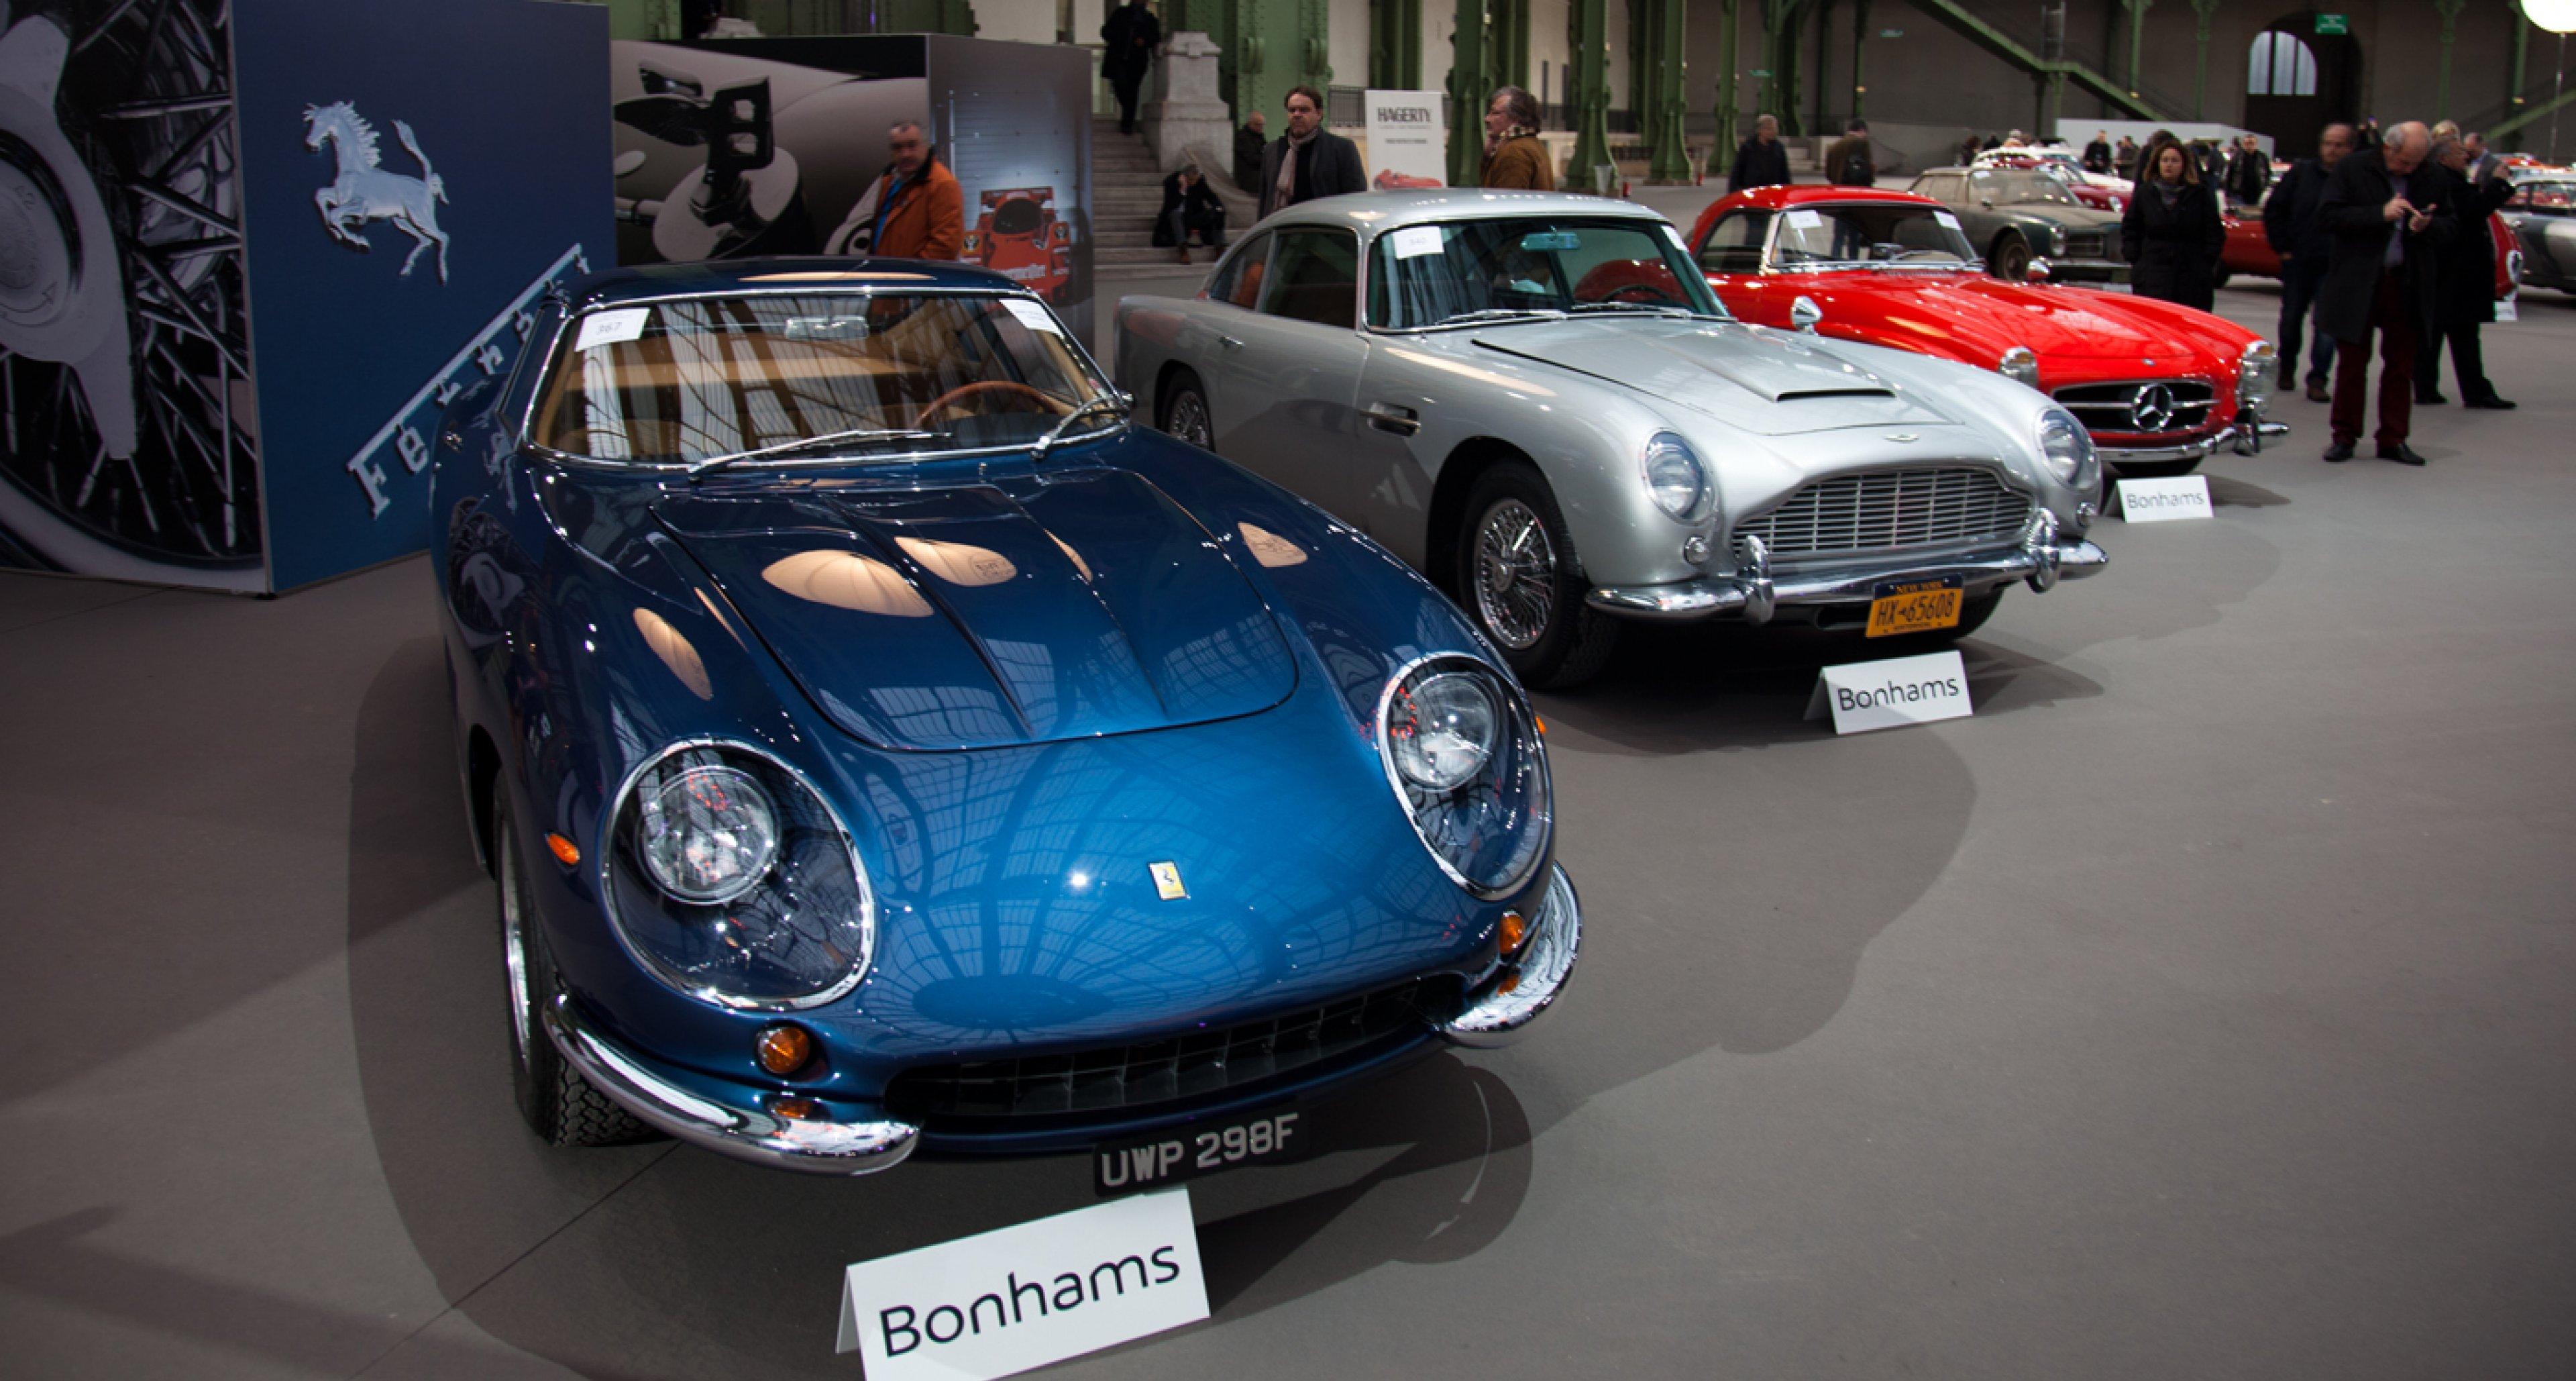 Million dollar beauties at Bonhams' Retromobile sale 2014 at Grand Palais, Paris: Ferrari 275GTB/4 (sold for €2,218,333), Aston Martin DB5 (sold for €776,250) and Mercedes 300SL Roadster (sold for € 713.000).